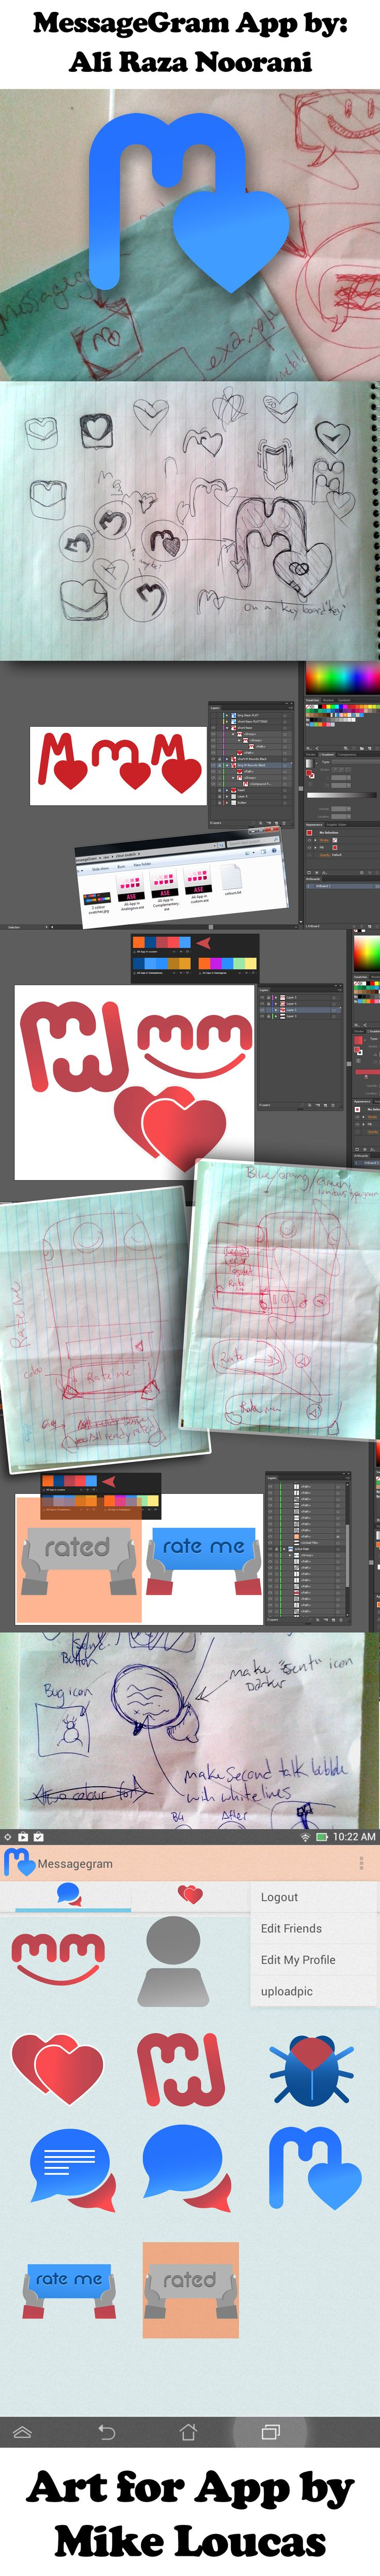 (in development) MessageGram App by: Ali Raza Noorani http://ca.linkedin.com/pub/ali-noorani/61/624/475     Art By: Mike Loucas https://www.linkedin.com/in/mikeloucas